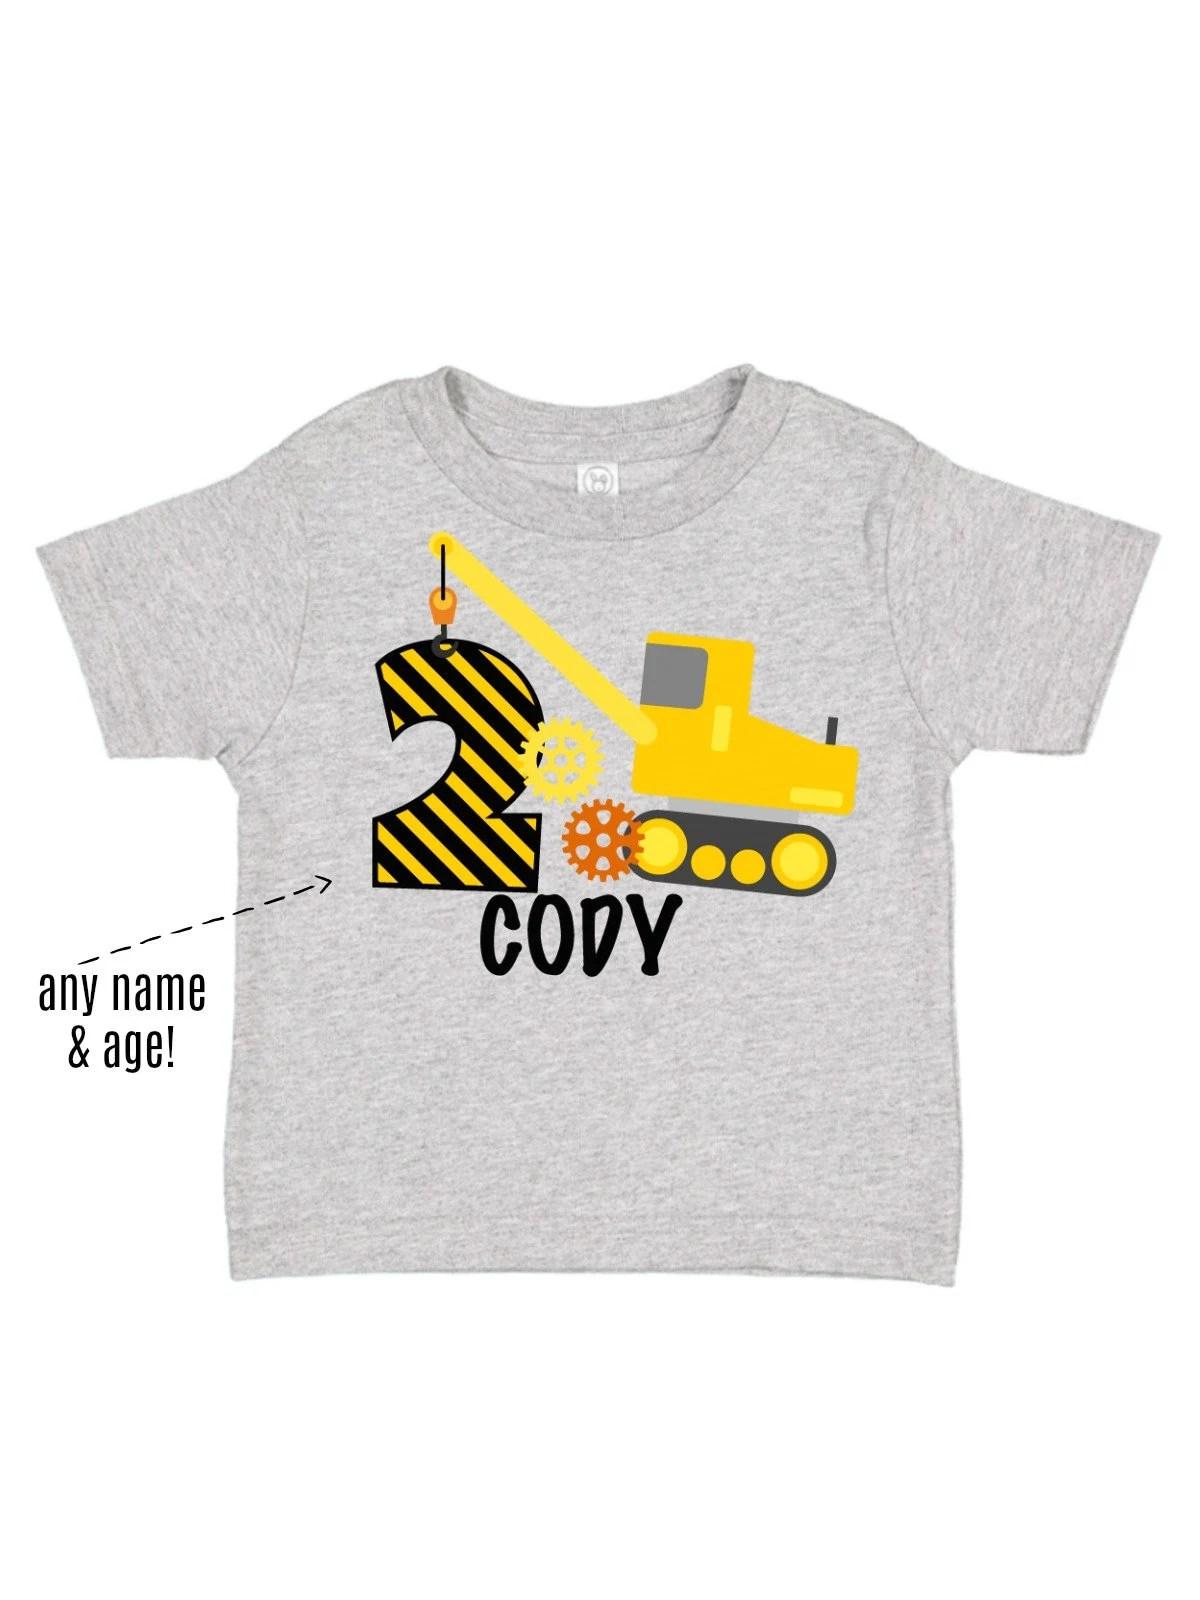 Boys Construction Excavator Birthday T Shirt Personalized Etsy